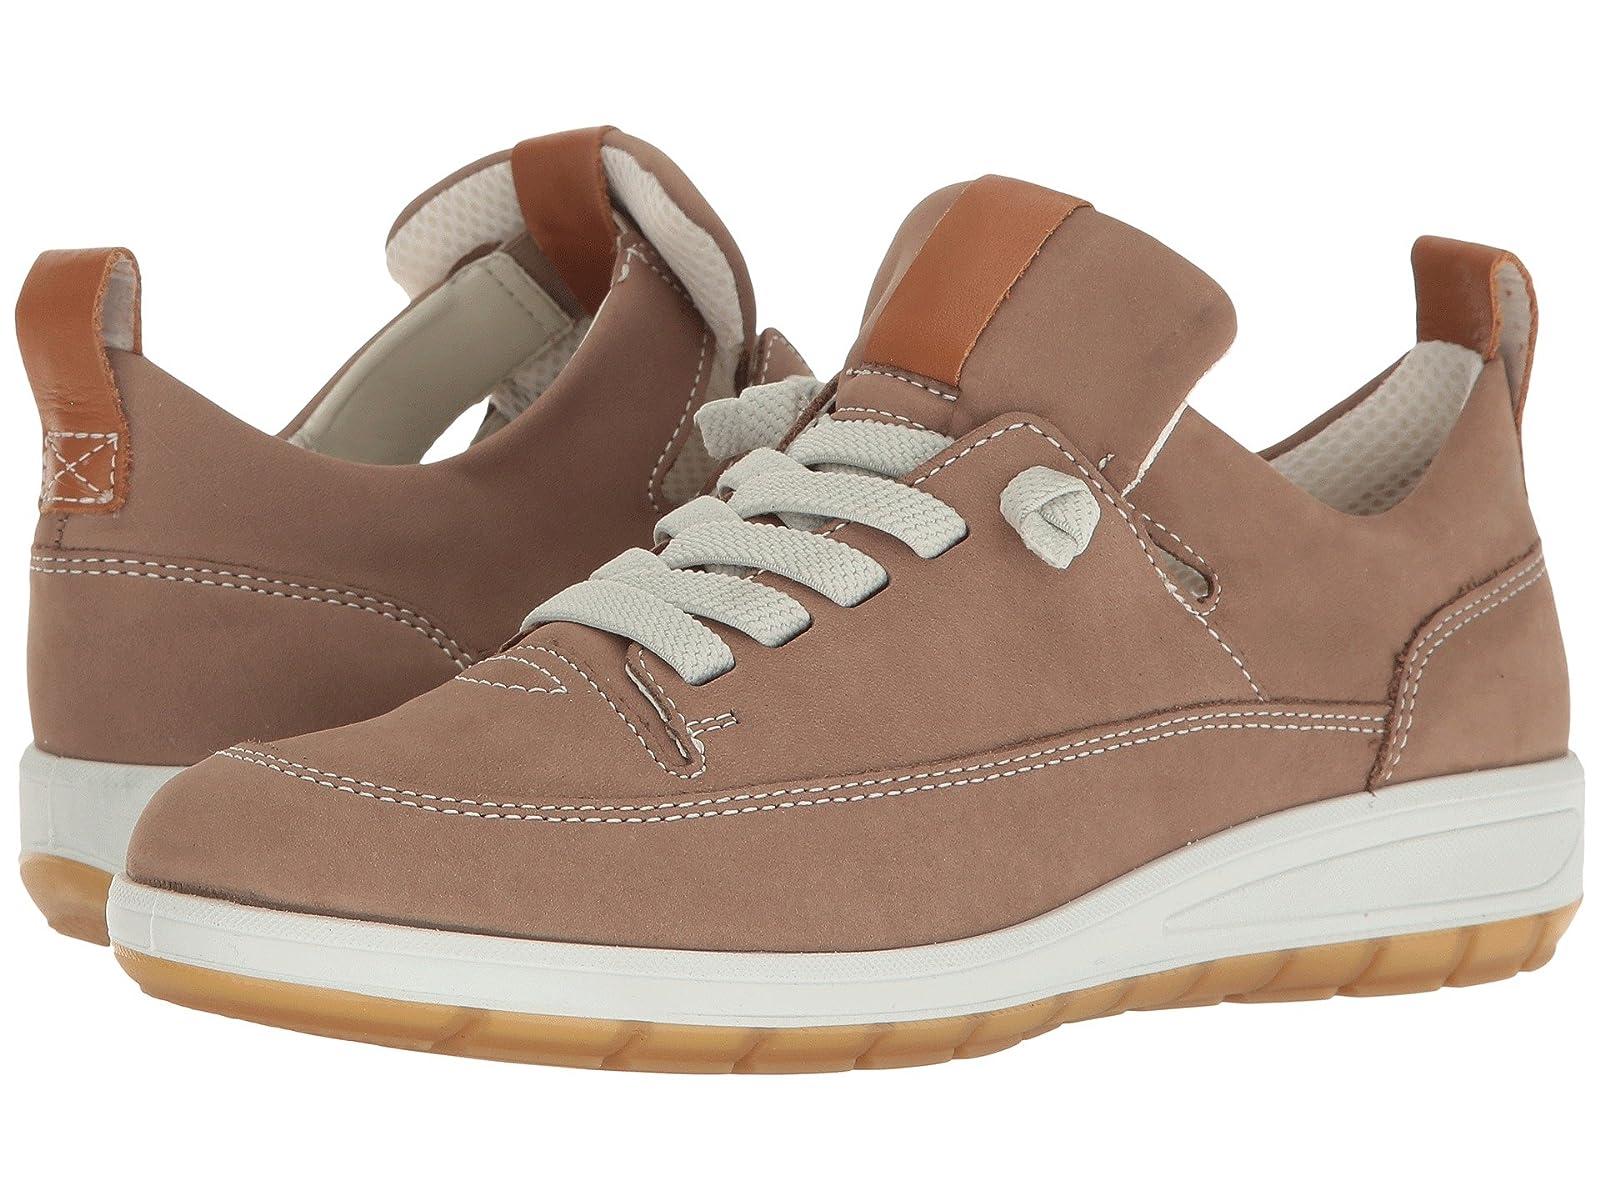 ara TinaCheap and distinctive eye-catching shoes